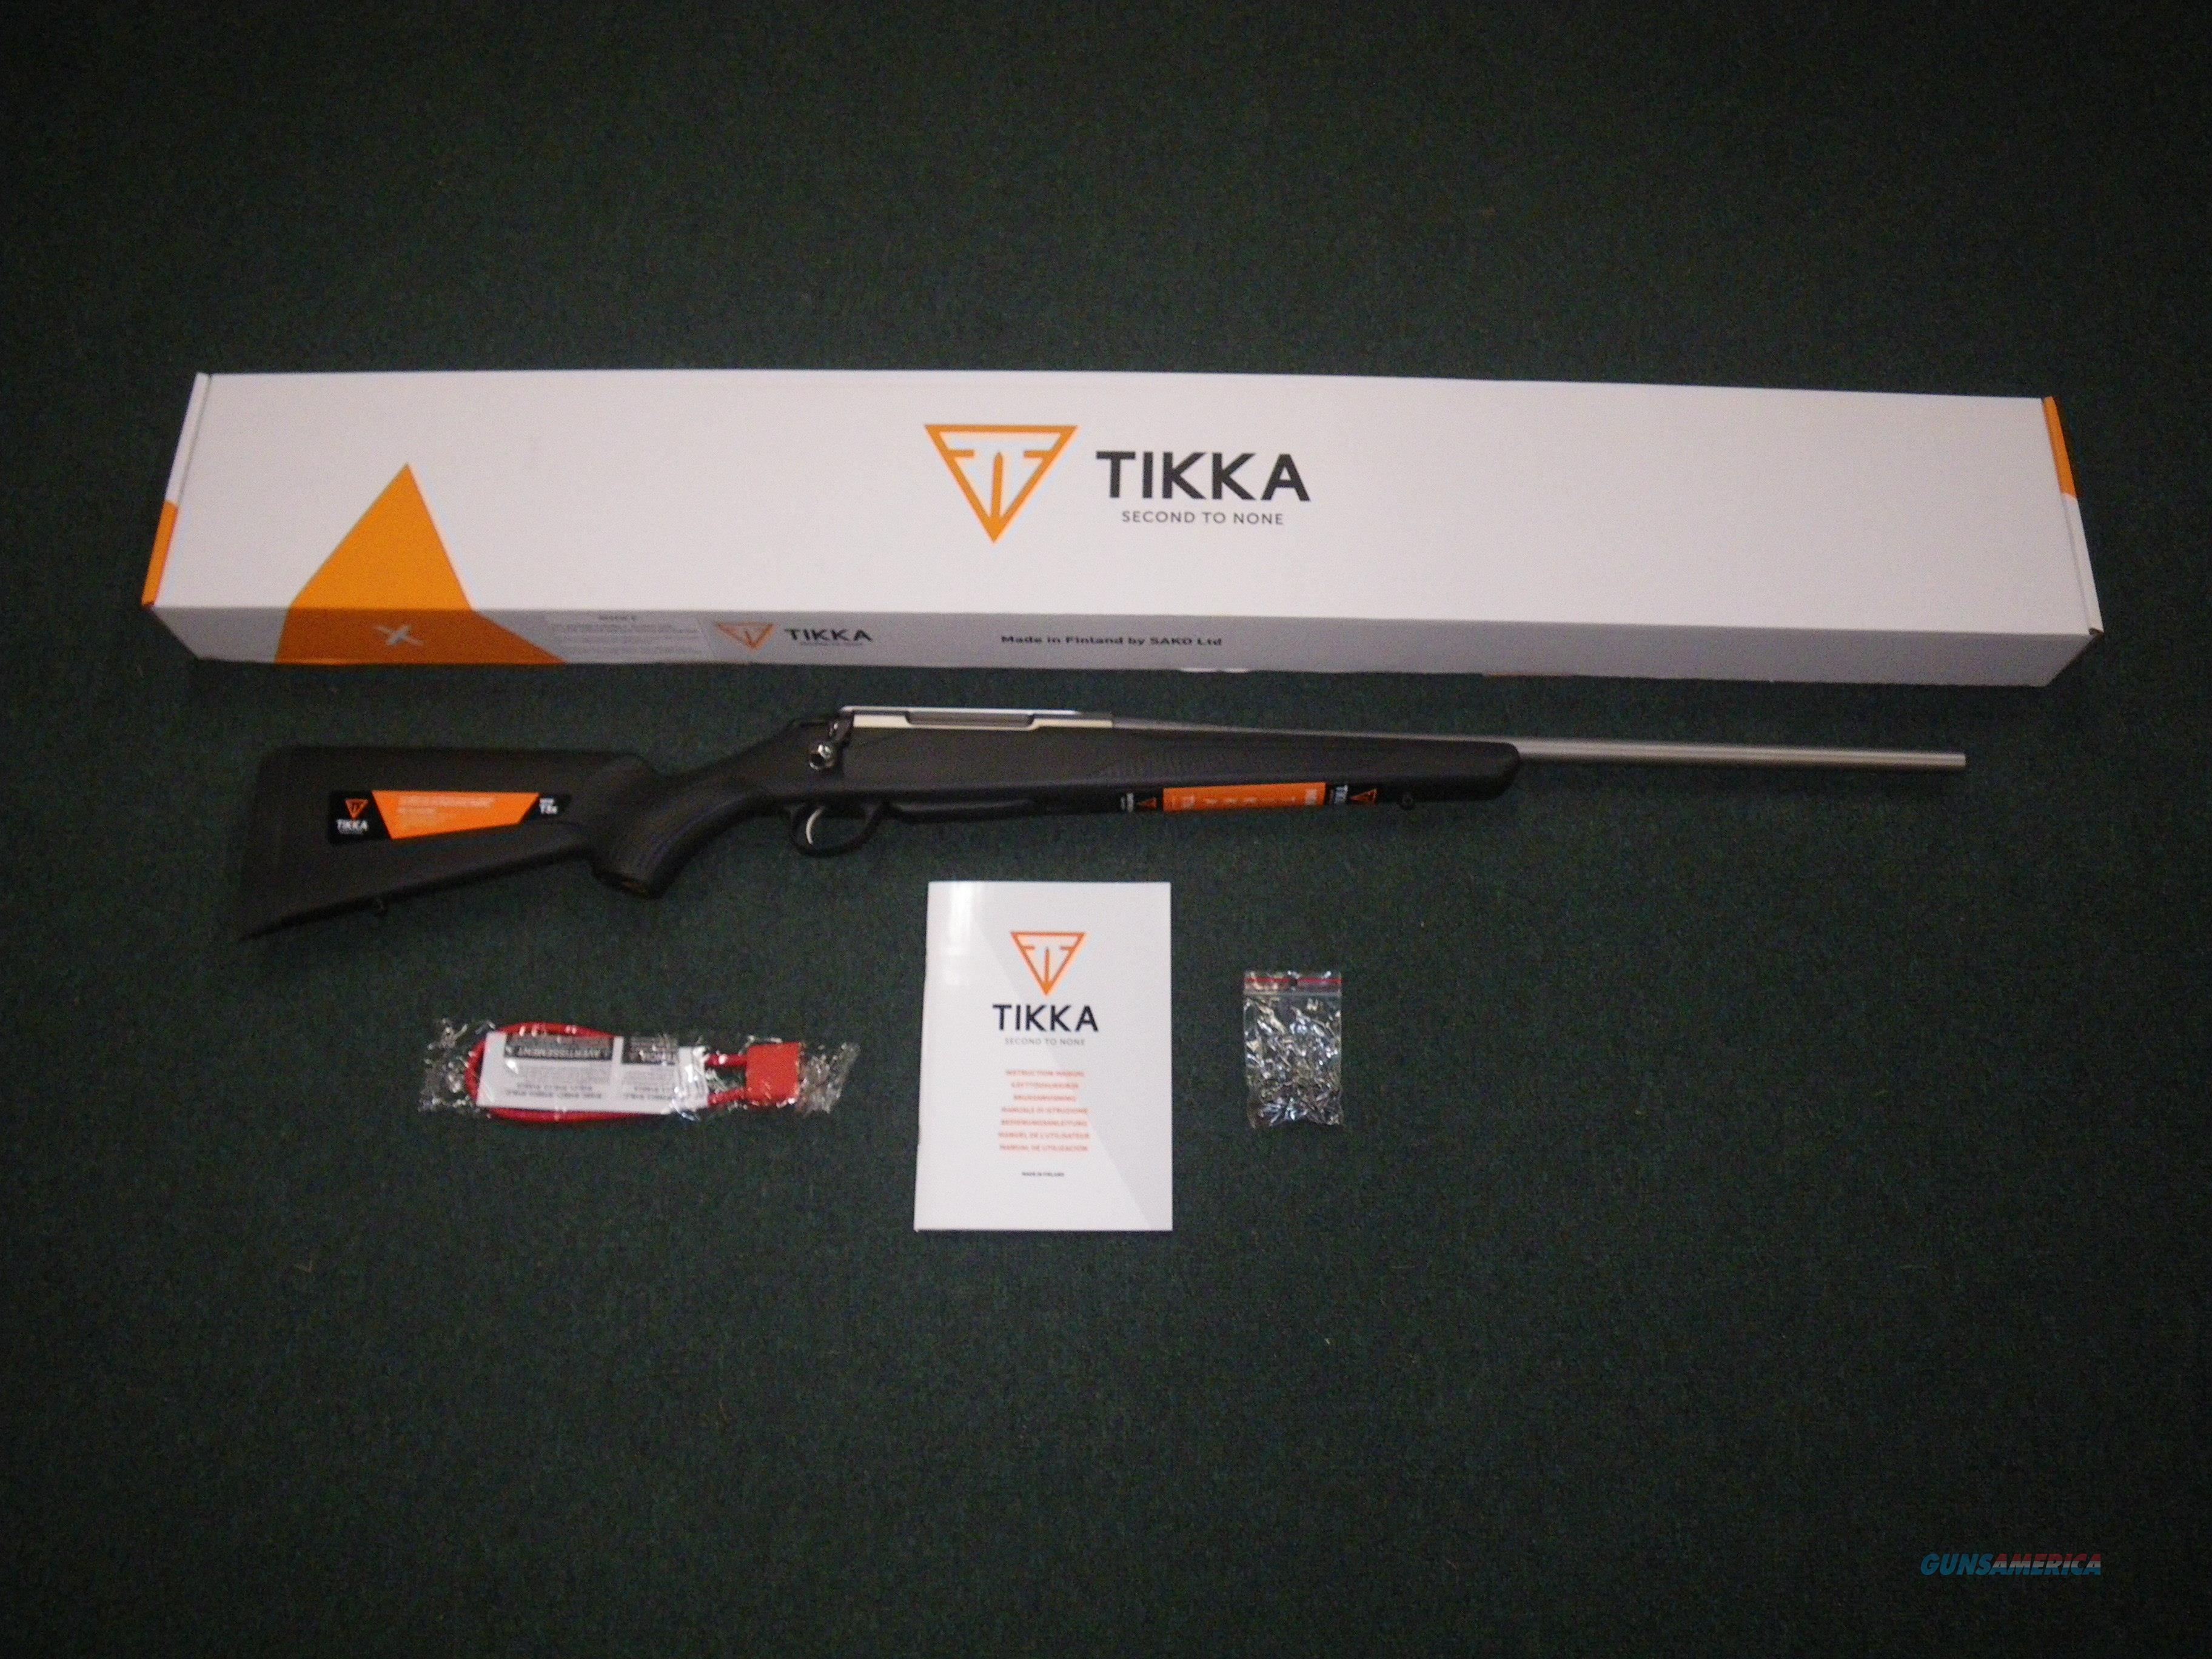 "Tikka T3x Lite Stainless Syn 300 WSM 24.3"" NEW JRTXB341  Guns > Rifles > Tikka Rifles > T3"